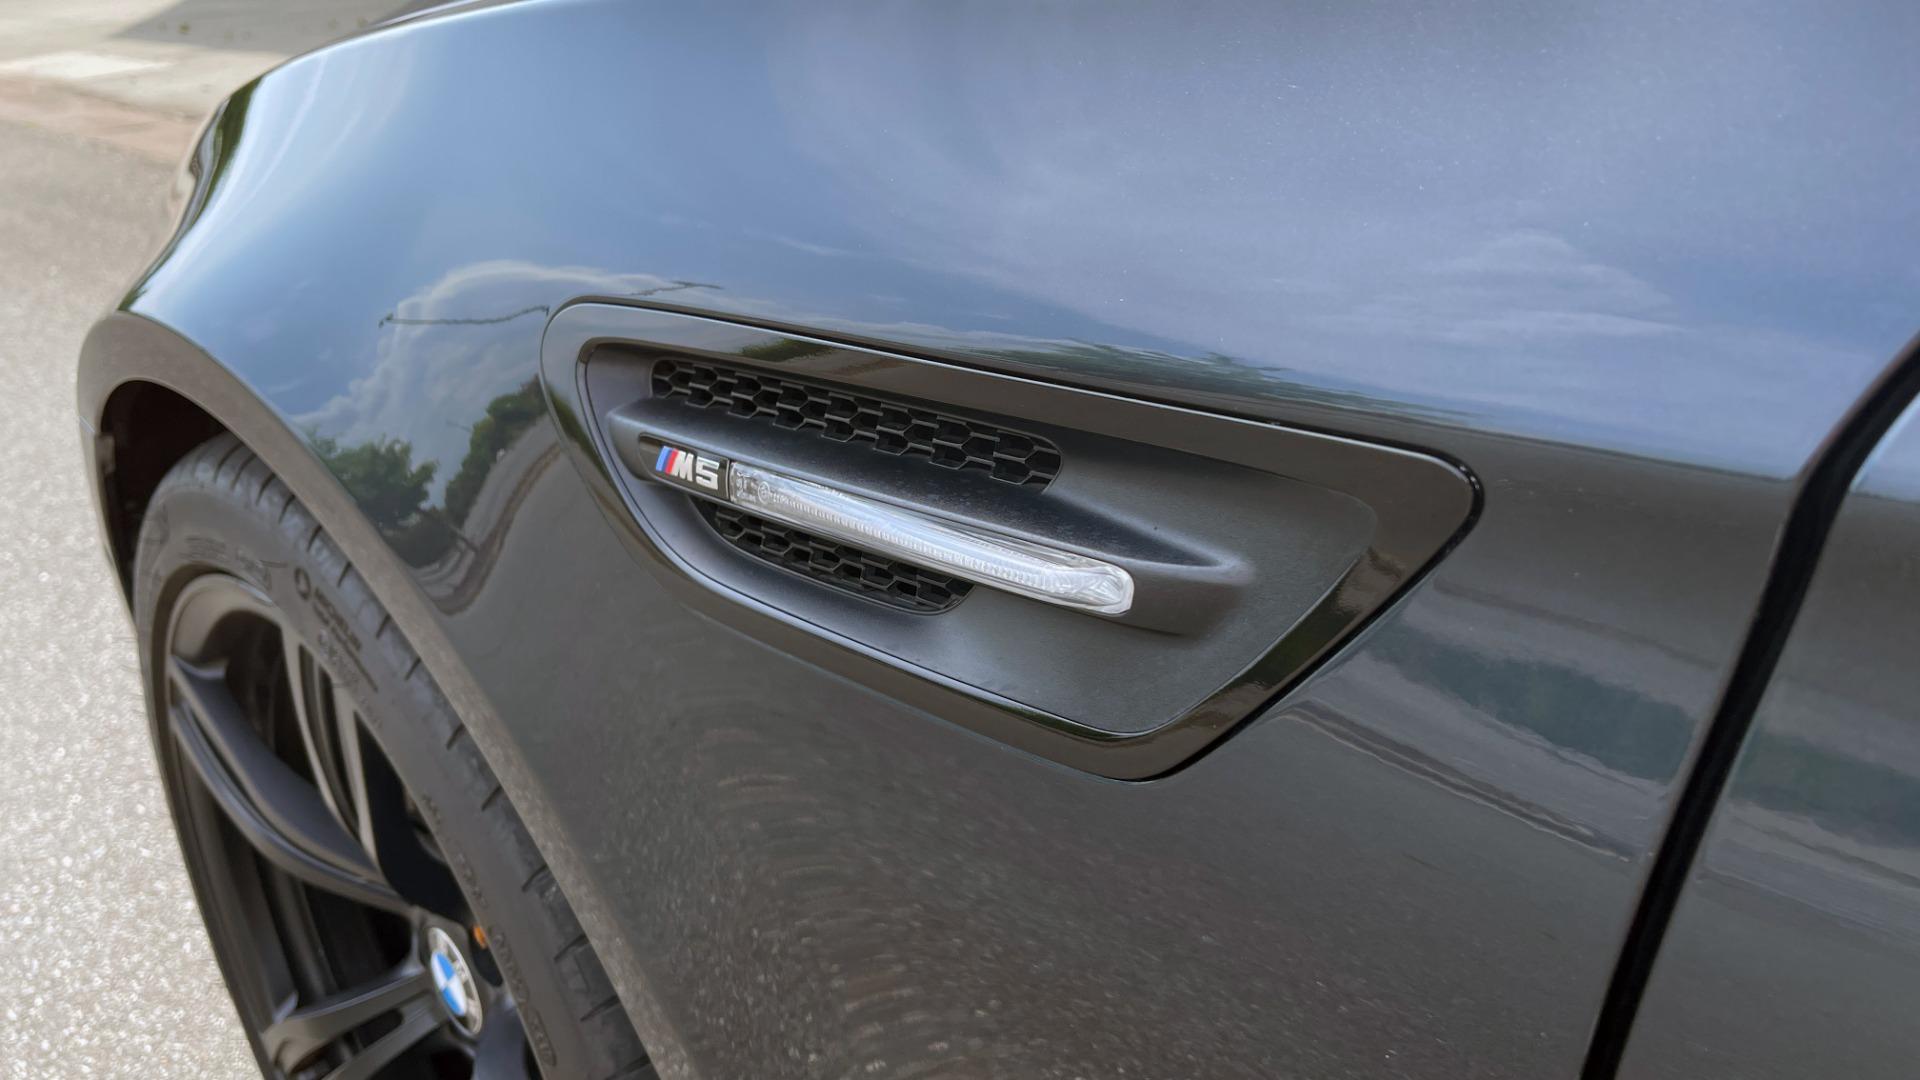 Used 2015 BMW M5 SEDAN / EXEC PKG / HUD / NAV / B&O SND / SUNROOF / REARVIEW for sale Sold at Formula Imports in Charlotte NC 28227 8